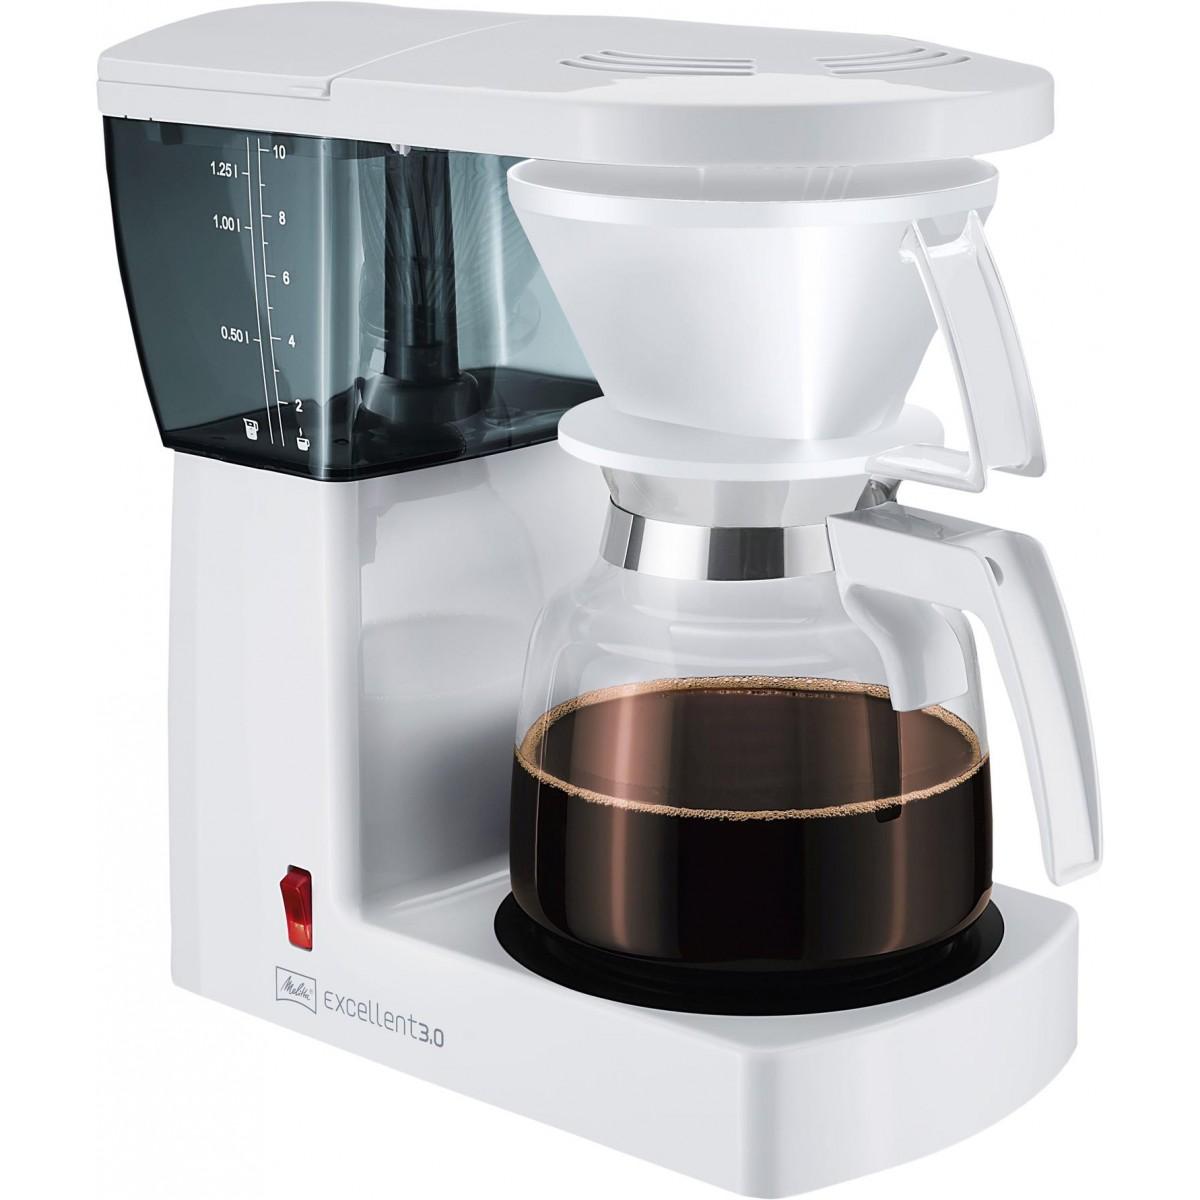 MELITTA Kaffemaskine excellent 4.0 hvid